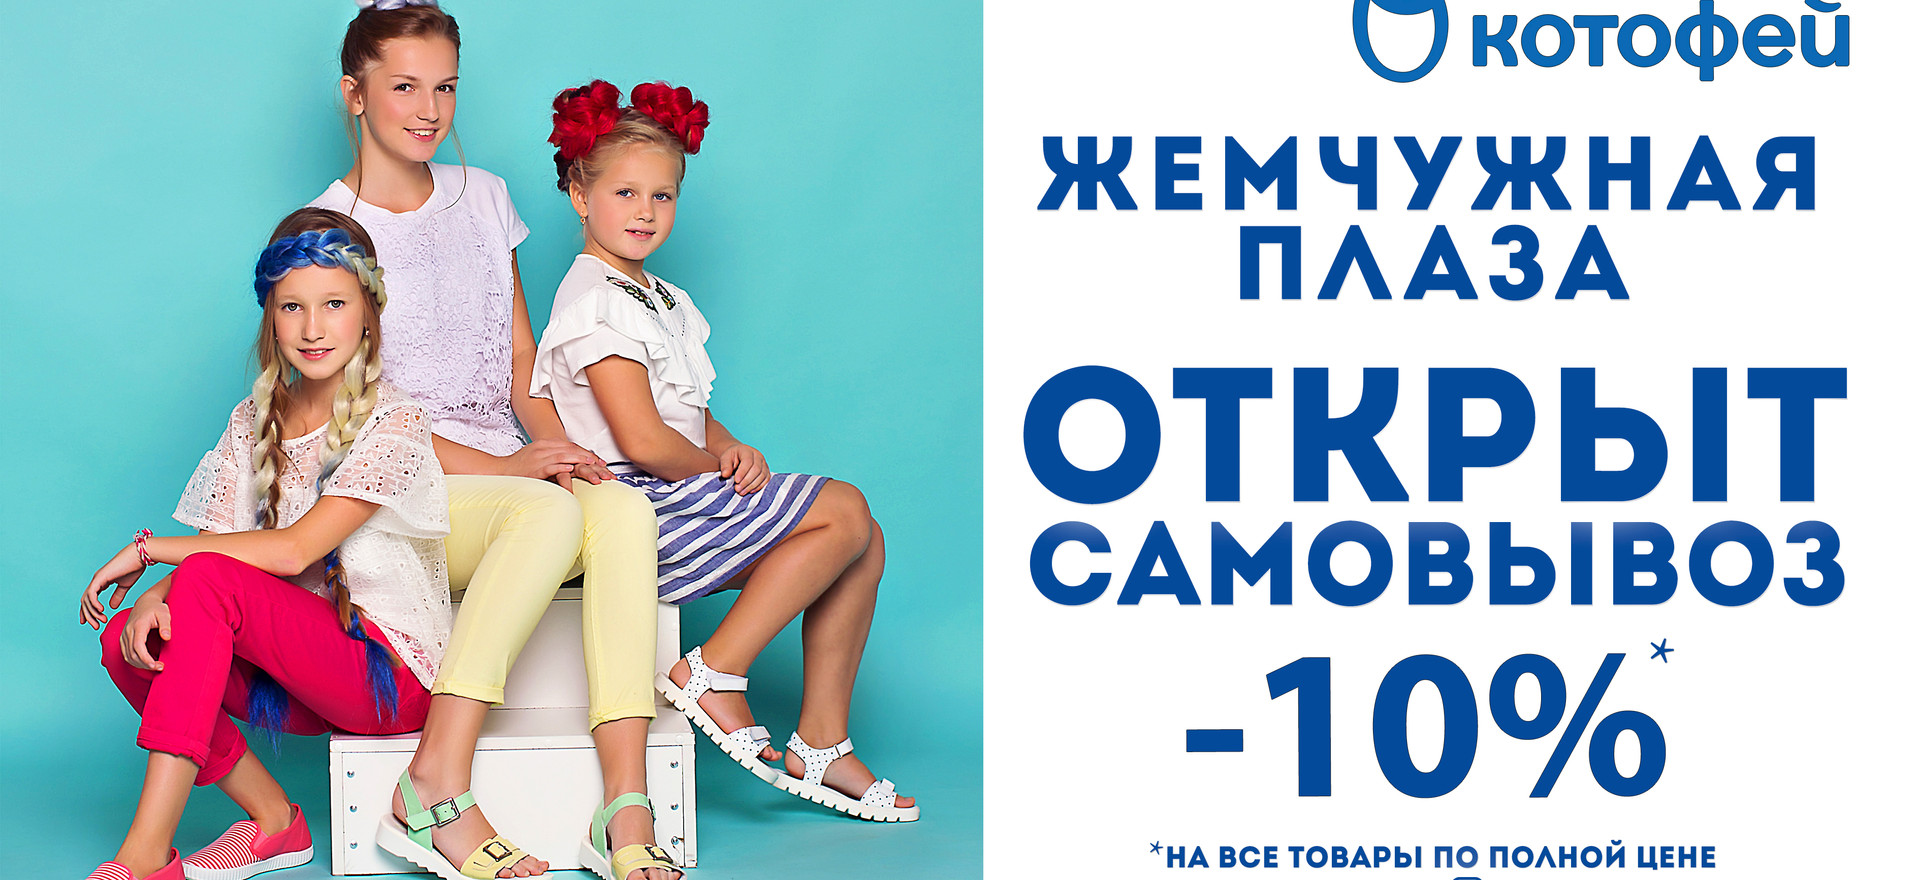 Котофей жемчужная Плаза.jpg